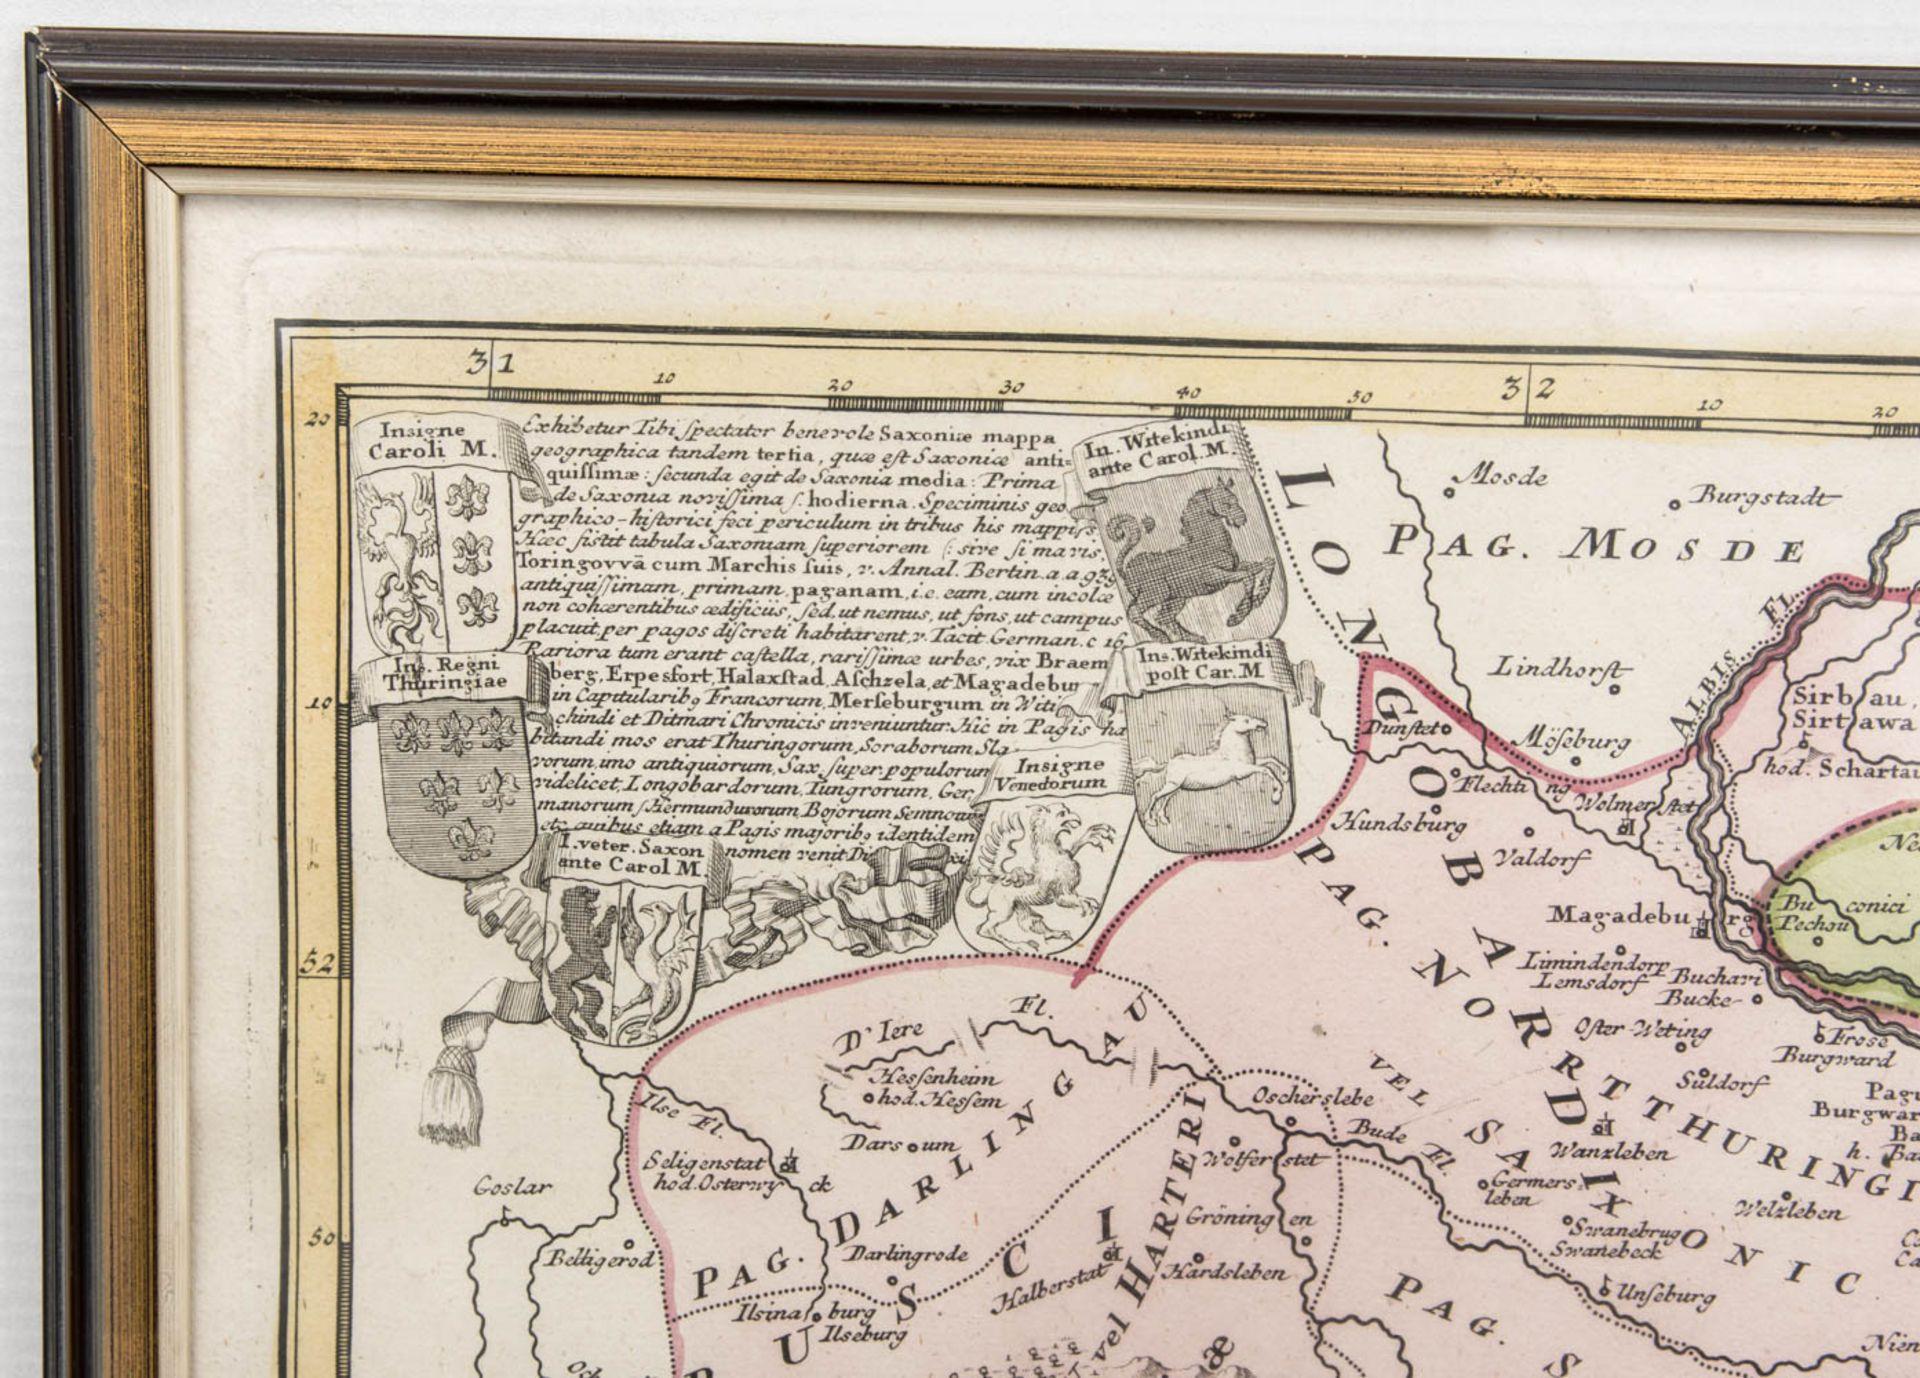 Ducatus Saxoniae, Antike Landkarte des Frankenreiches.Hinter Glas gerahmt. 65 - Bild 3 aus 4